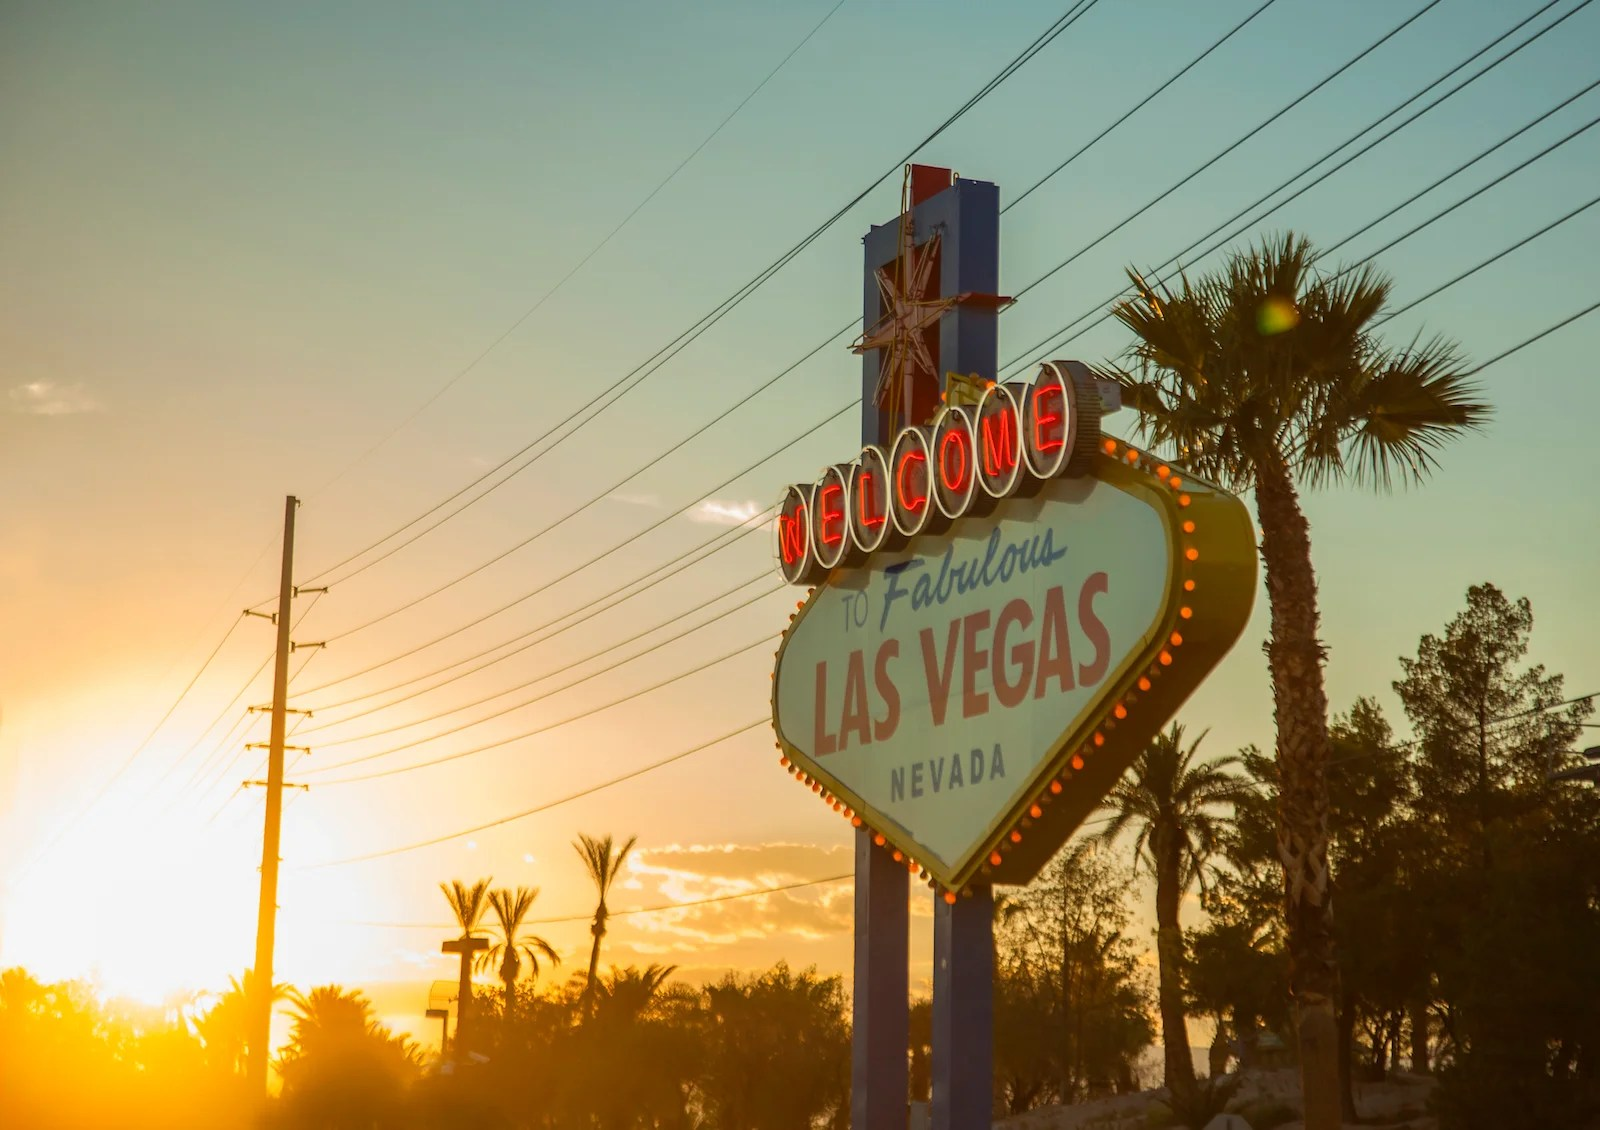 The caesars eldorado merger represents changes for casinos, vegas Engine Winslotmo online roulette india